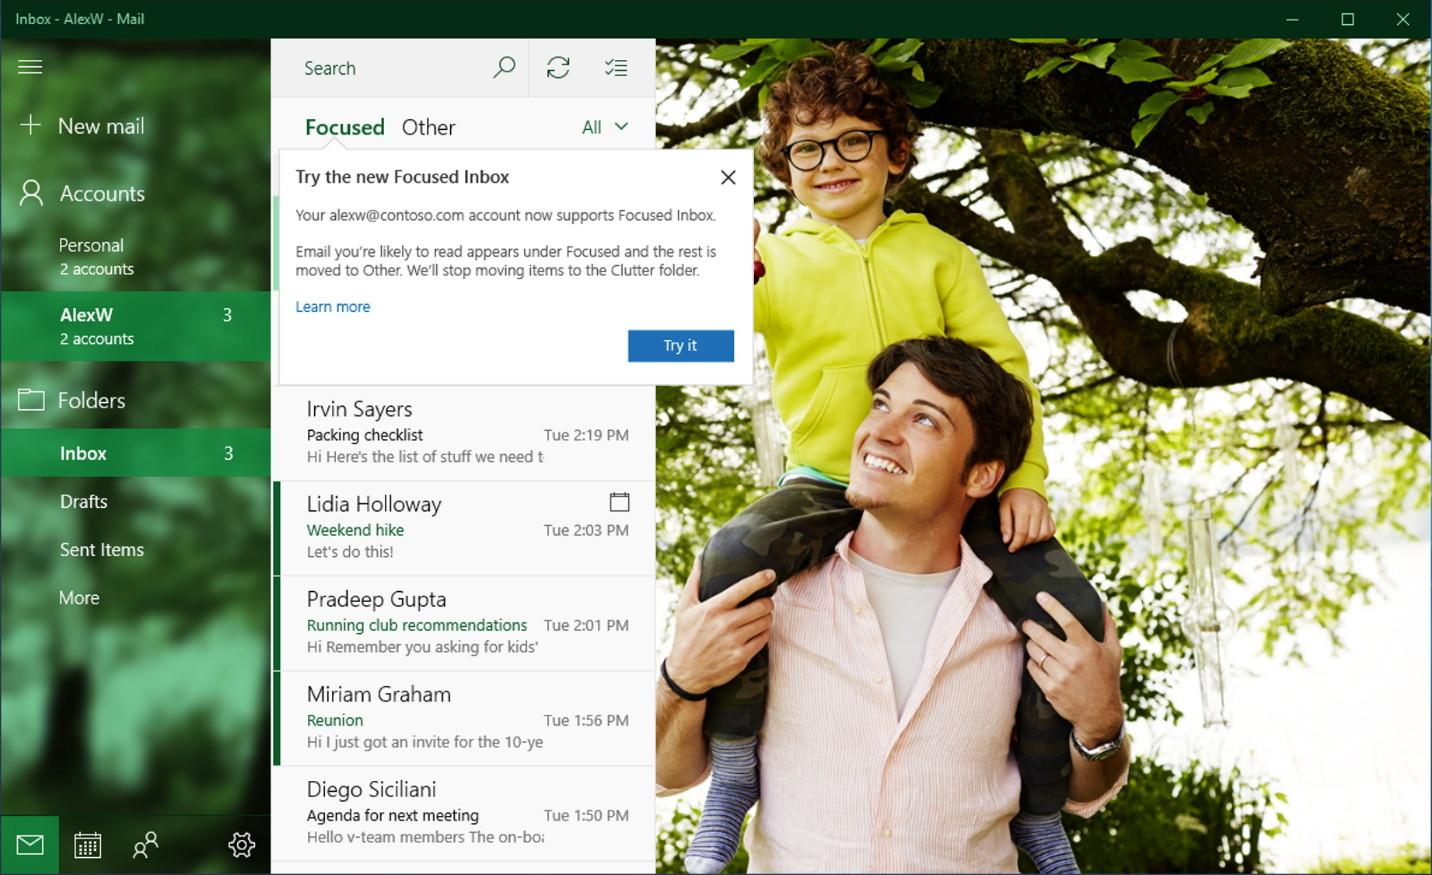 Windows 10 Mail app with Focused Inbox